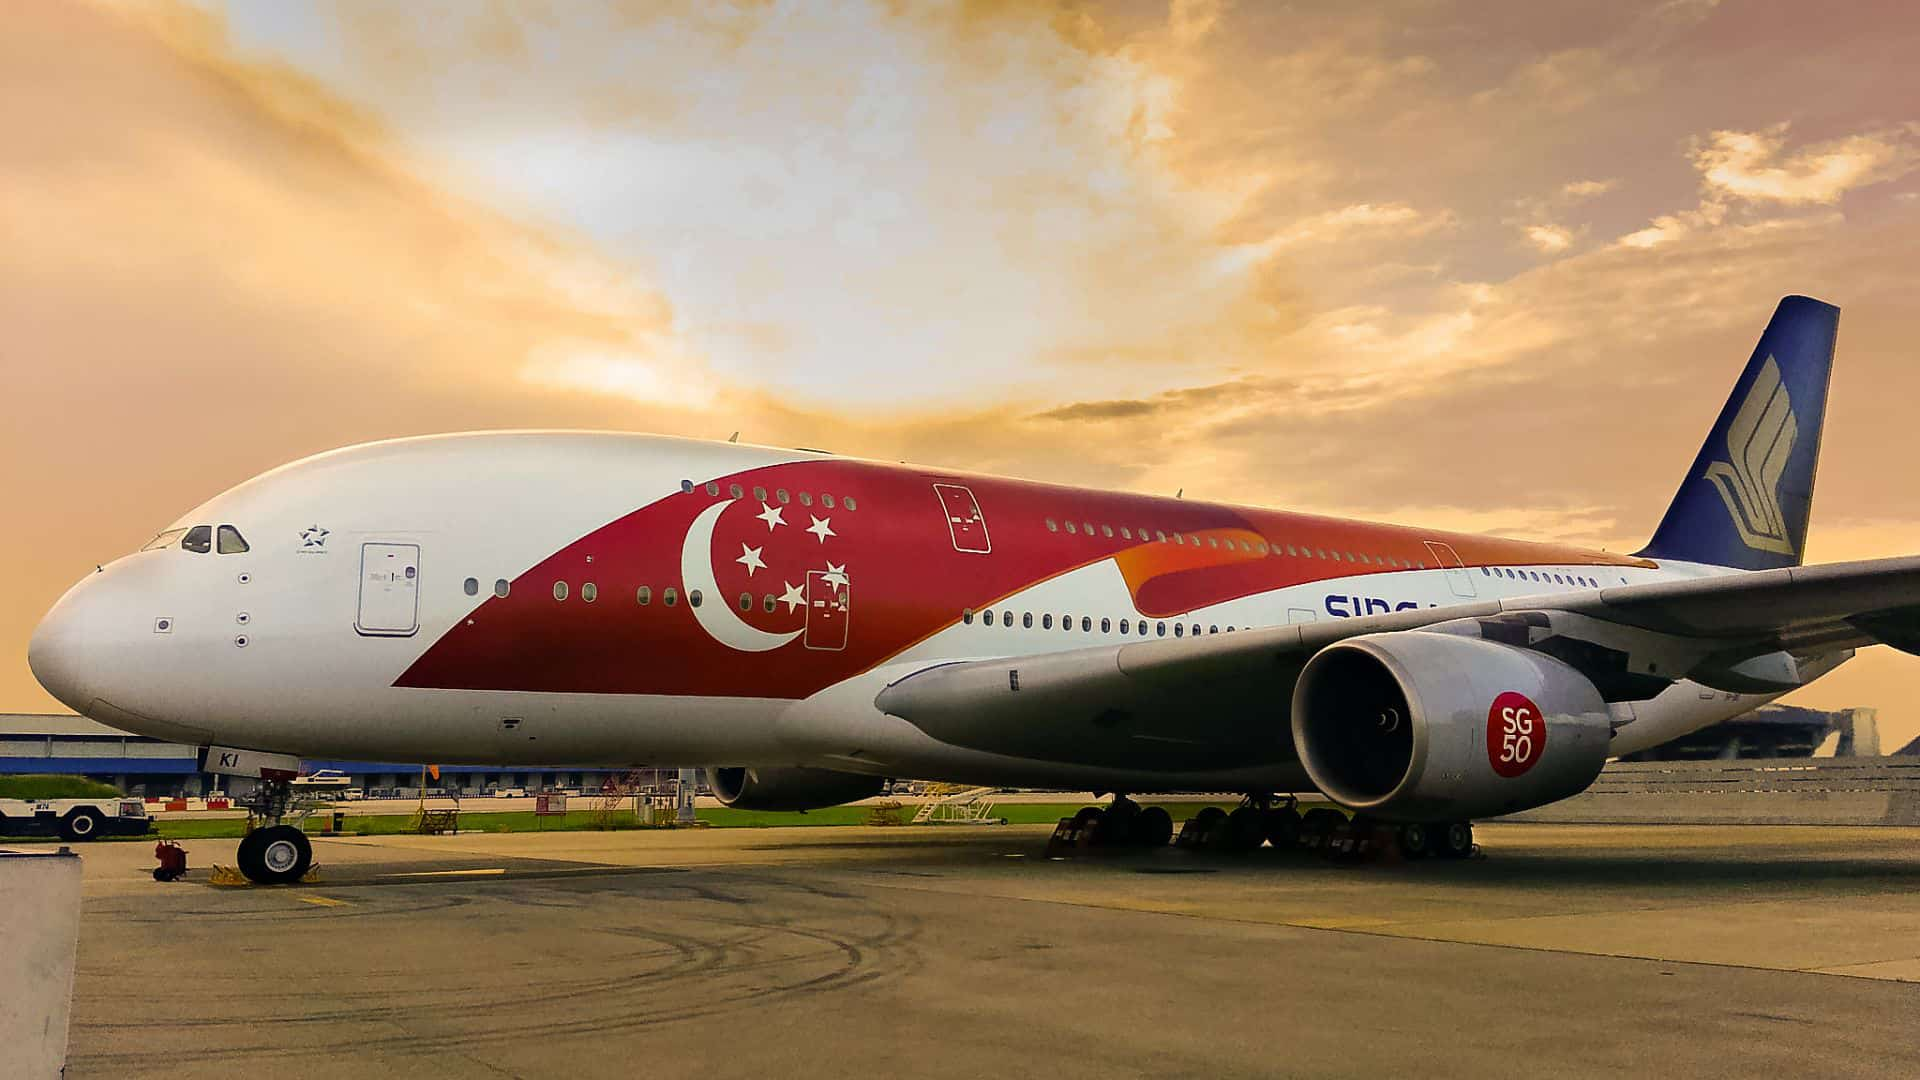 image-HEKLA Consulting : Specialiste des standards Aeronautiques a Singapour